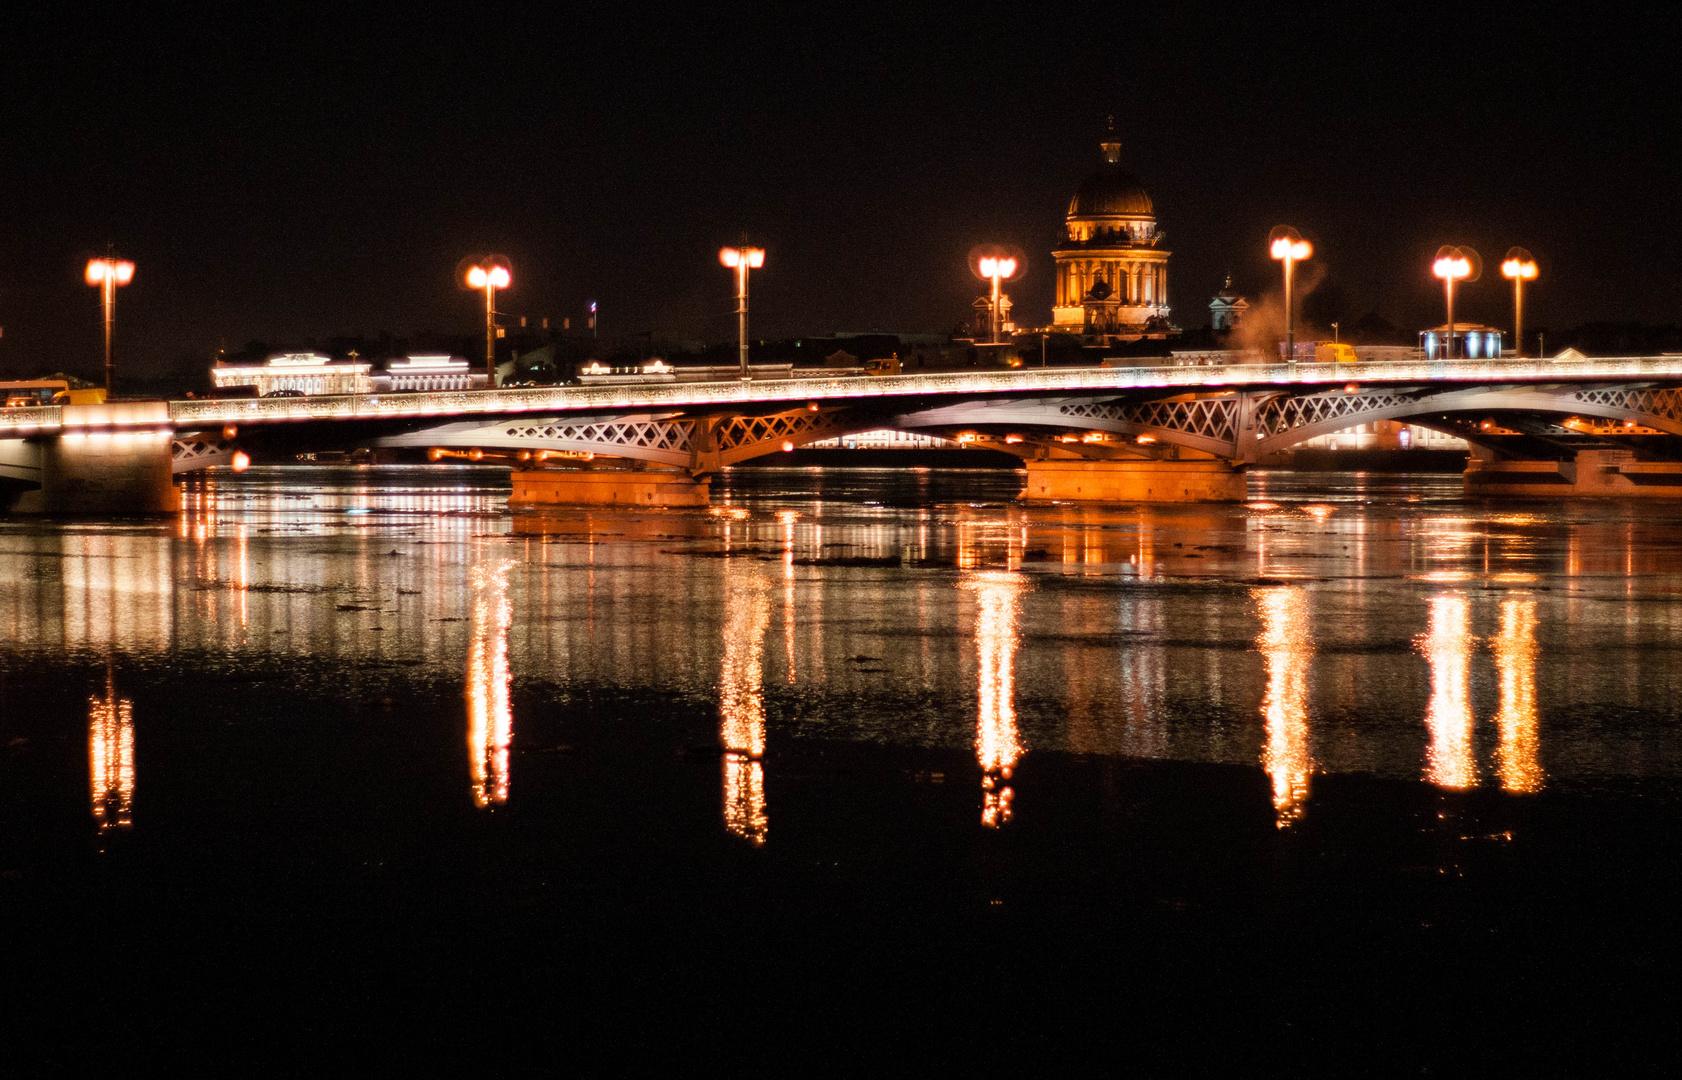 Verkündigung Bridge, St. Petersburg